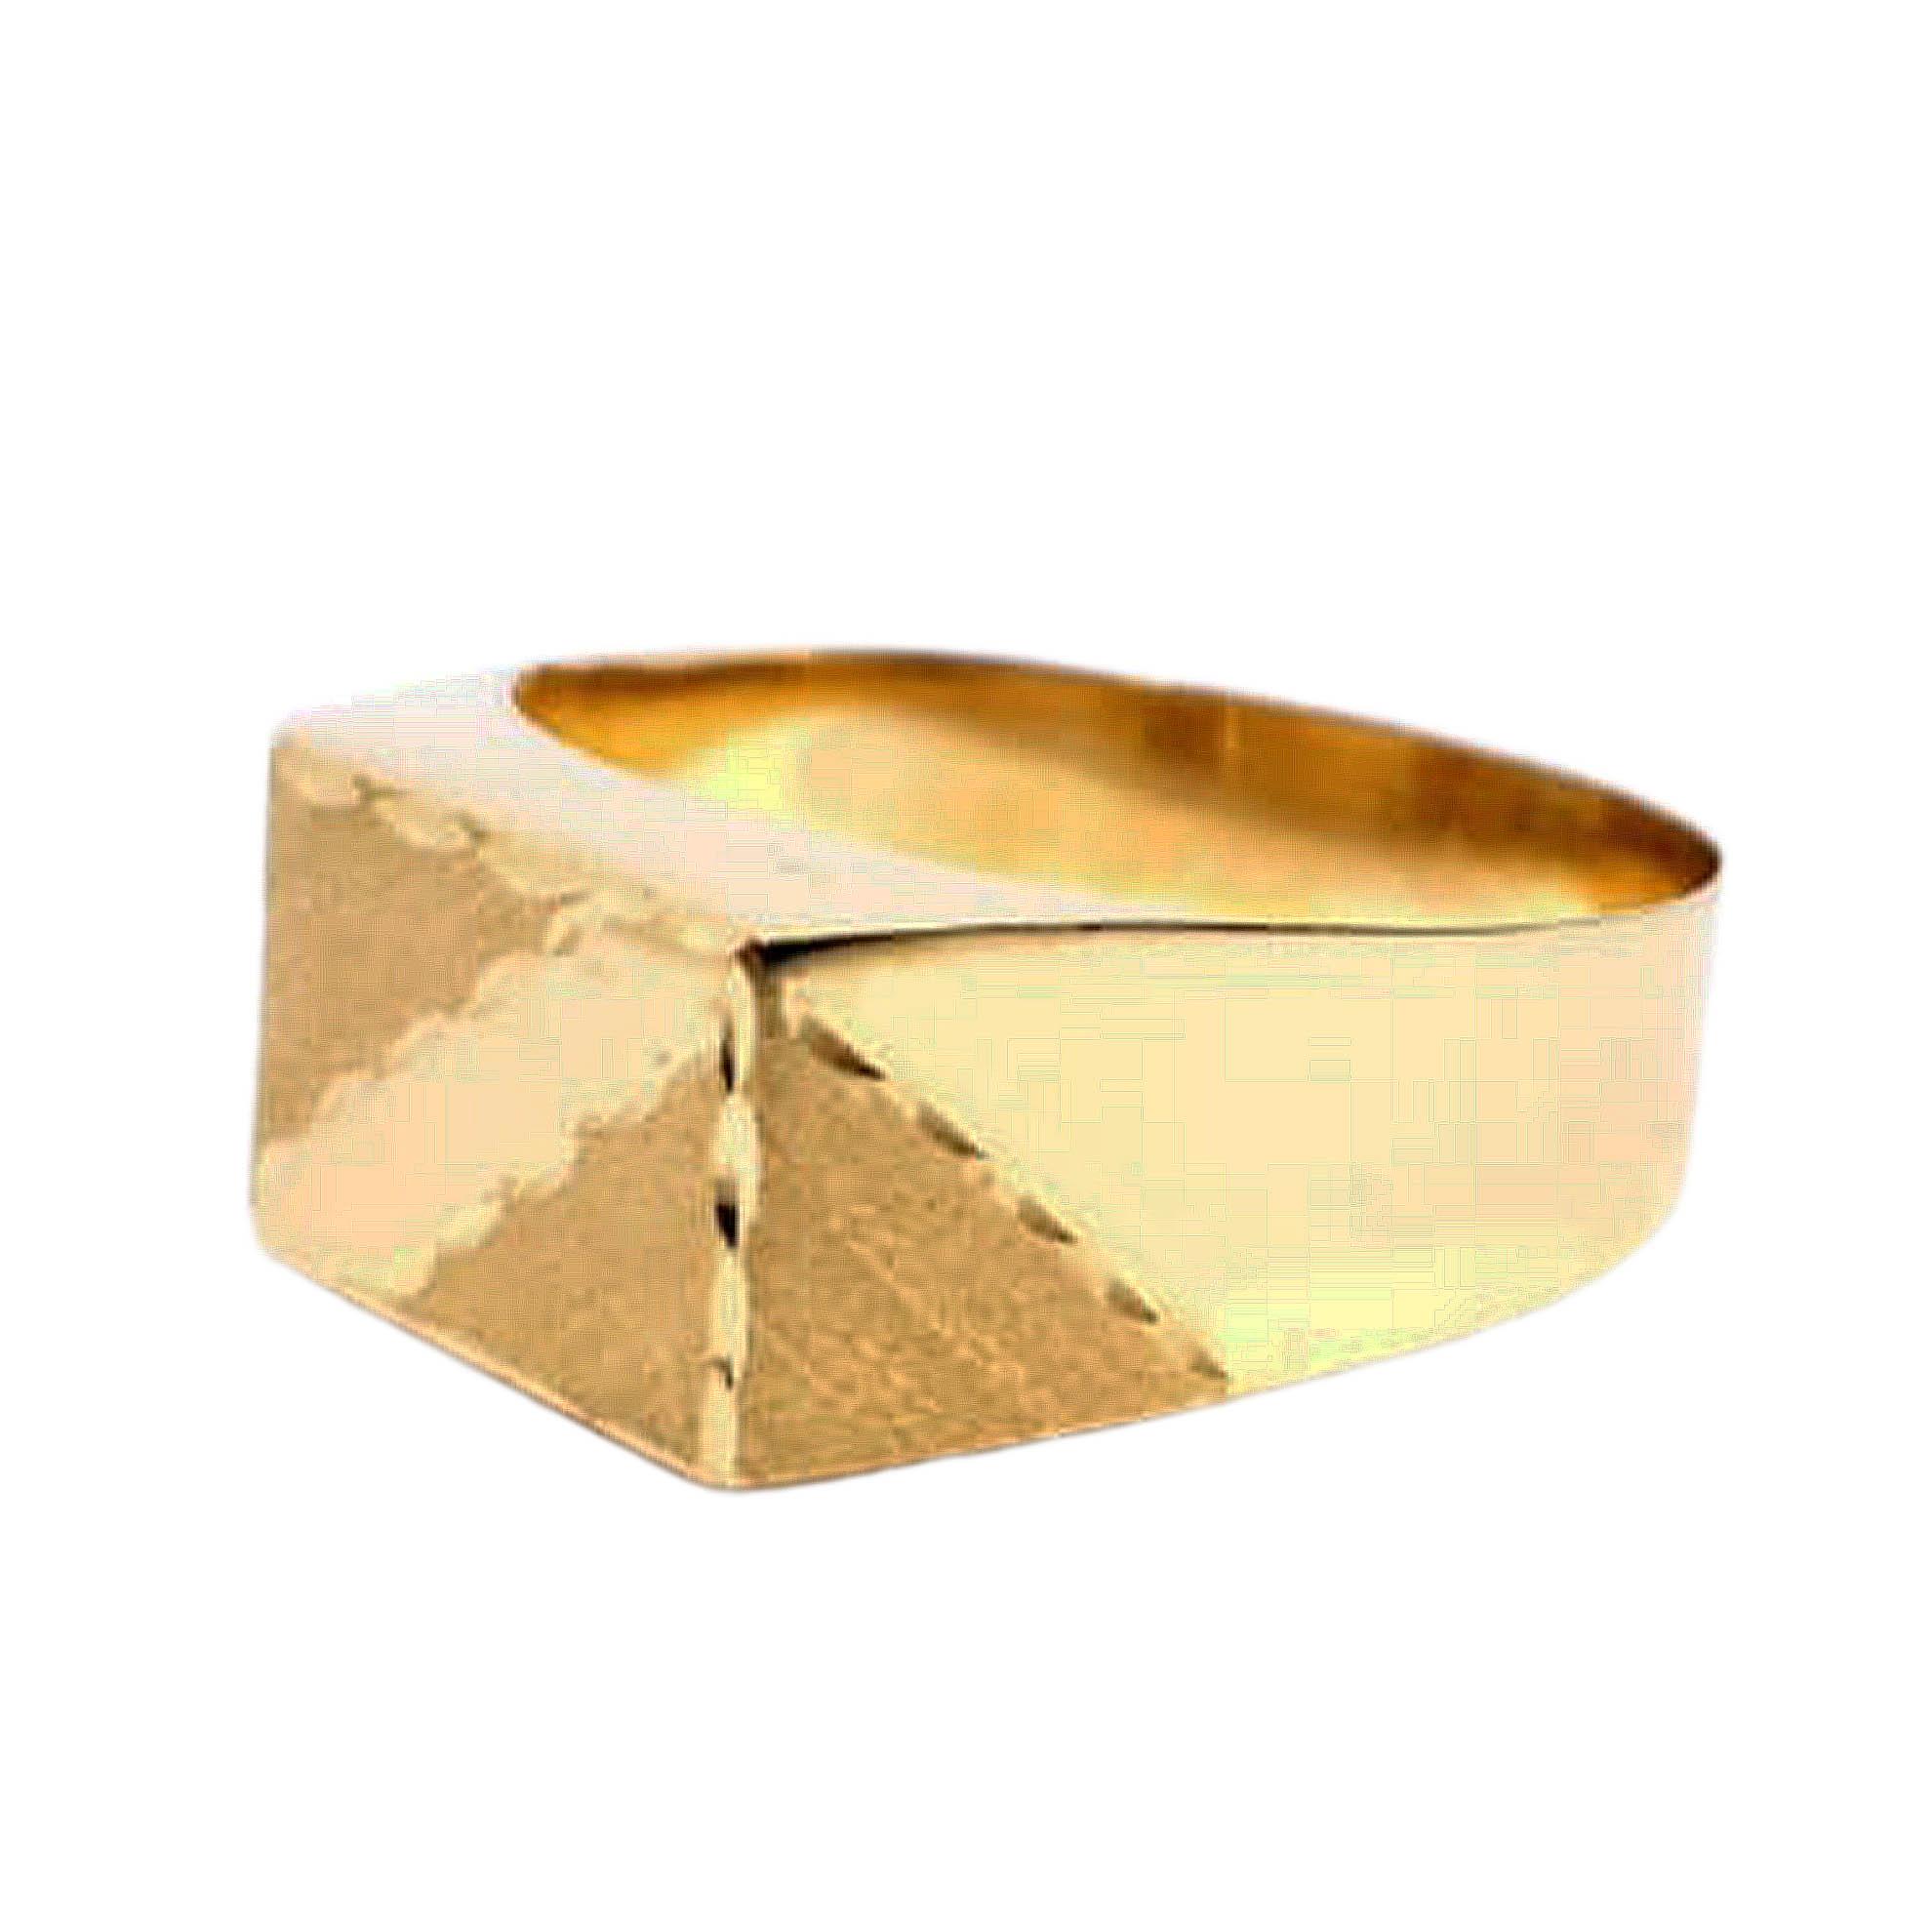 Anel Retângulo em Ouro 18 Kilates